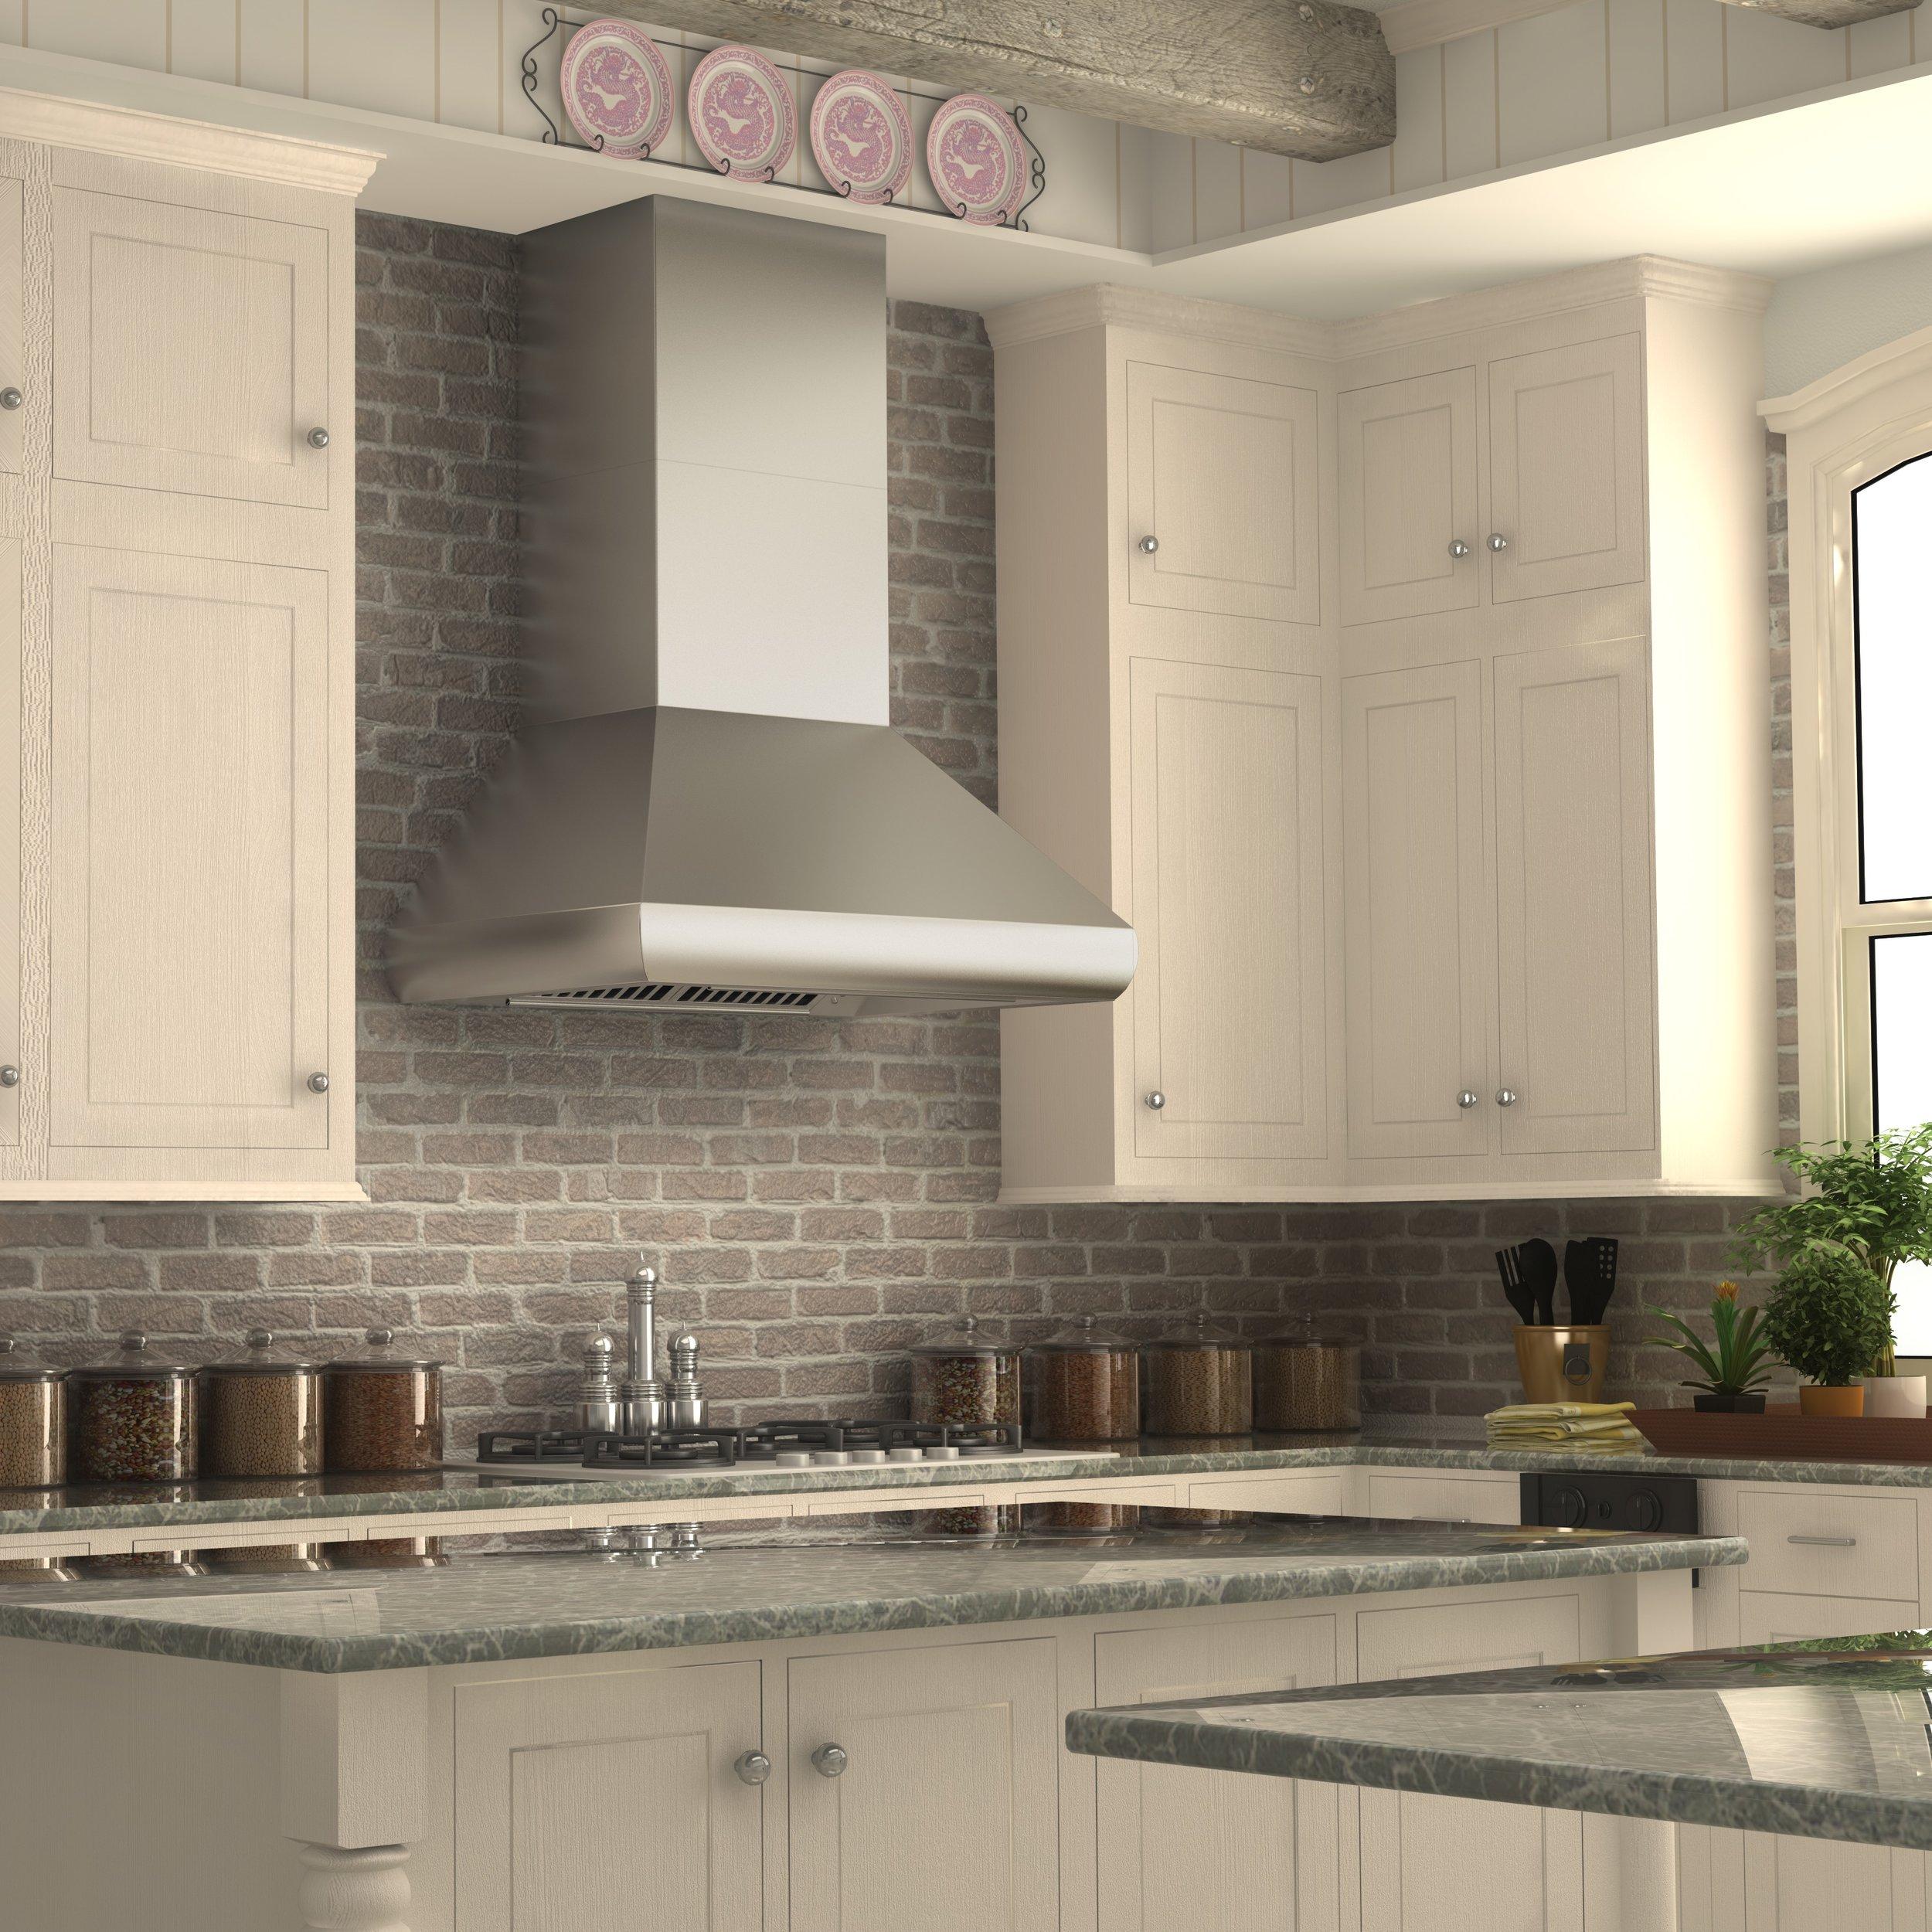 zline-stainless-steel-wall-mounted-range-hood-687-kitchen.jpeg